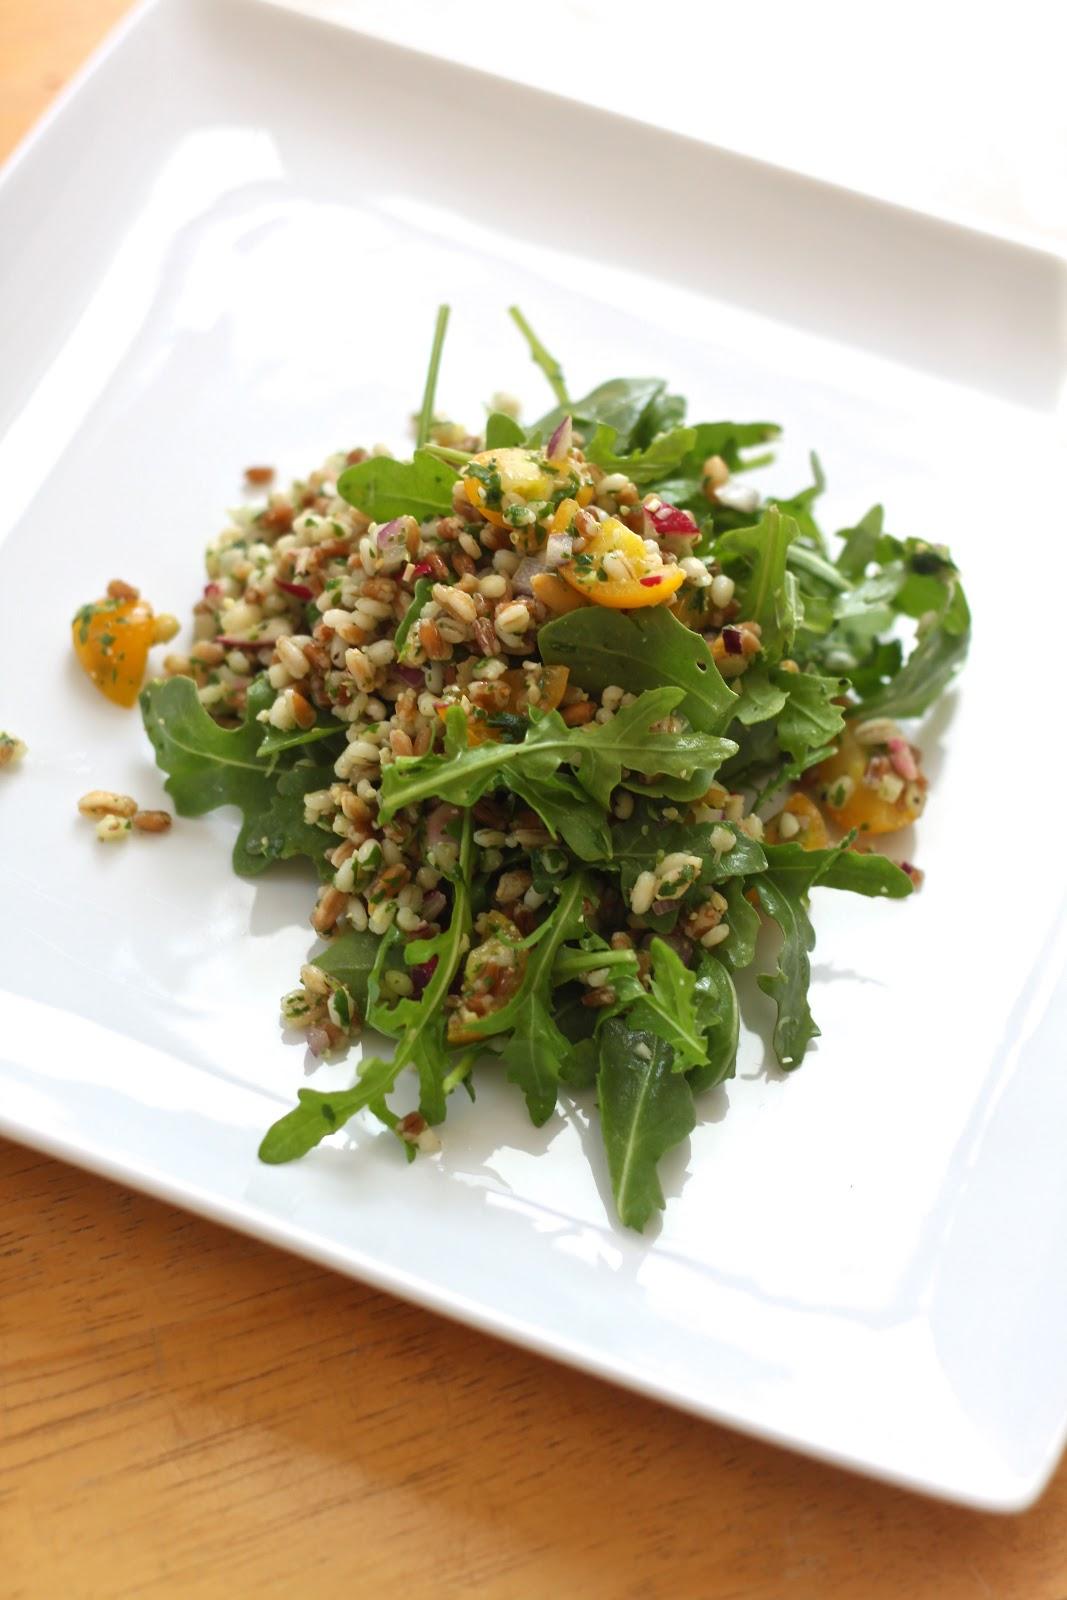 ... wheat berry salad with pistachio arugula pesto with arugula pesto